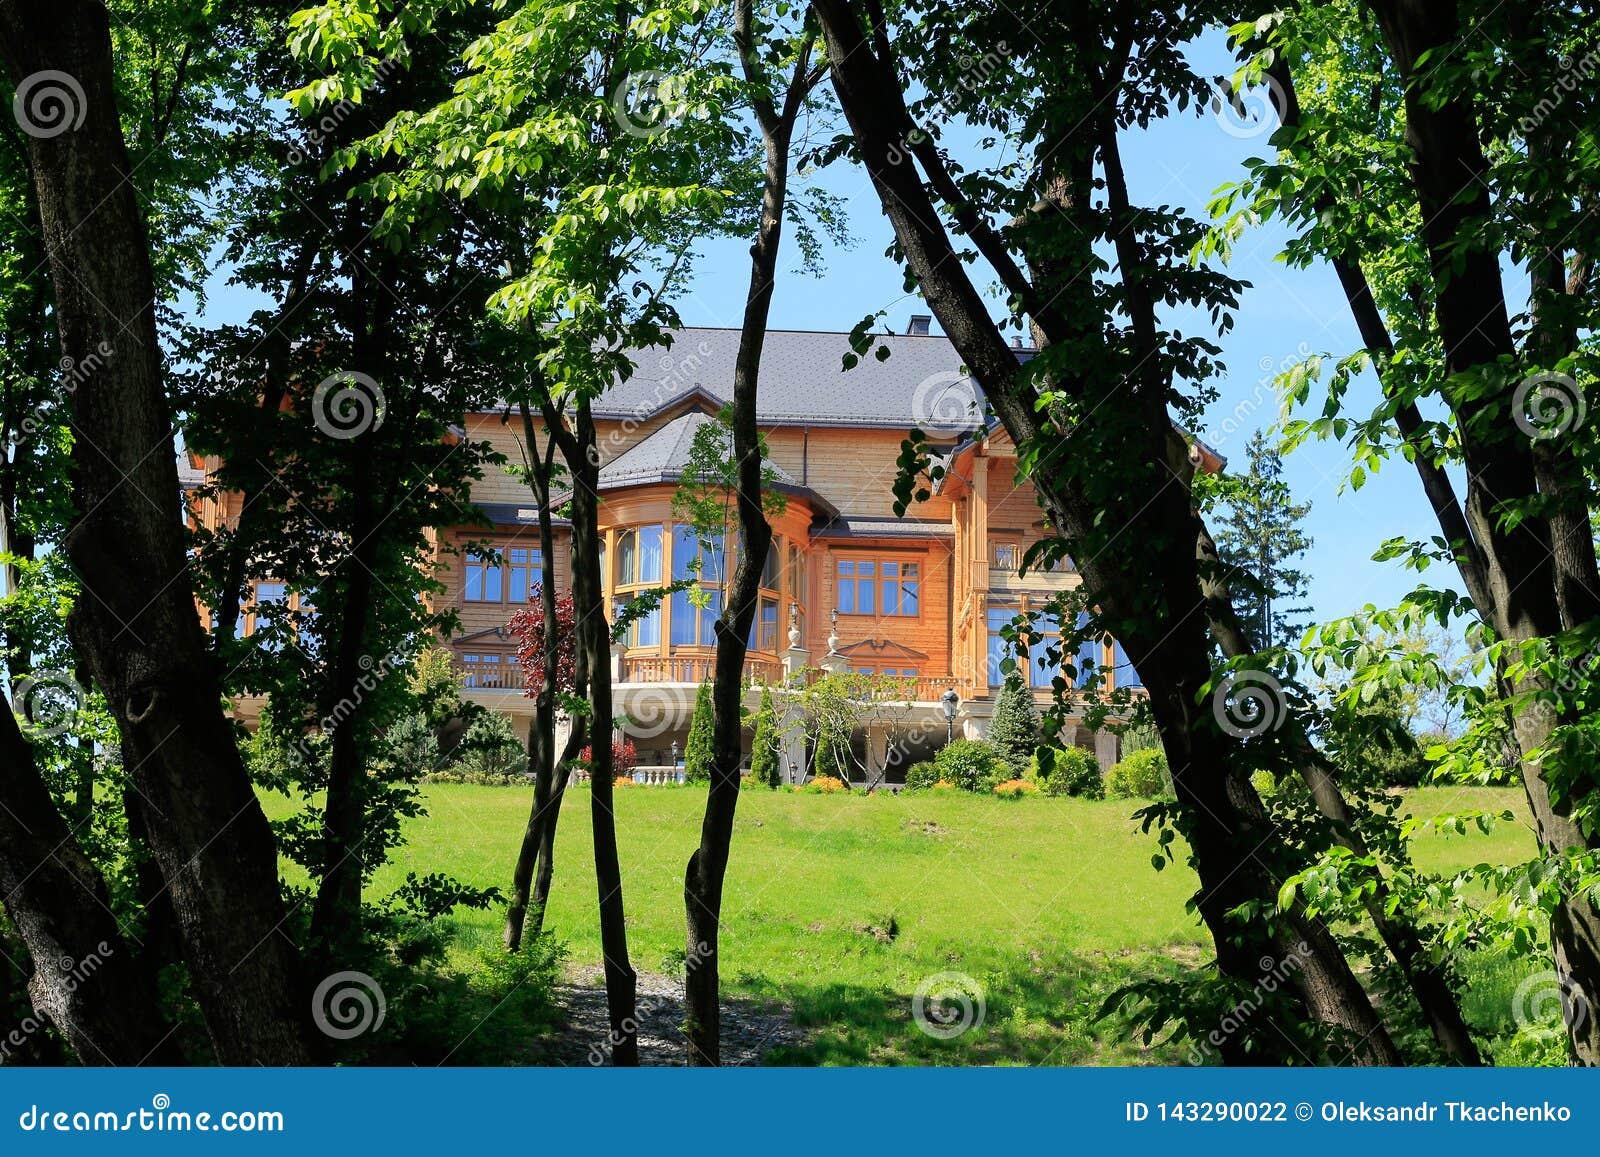 The Mezhyhirya Residence near the Kyiv, Ukraine